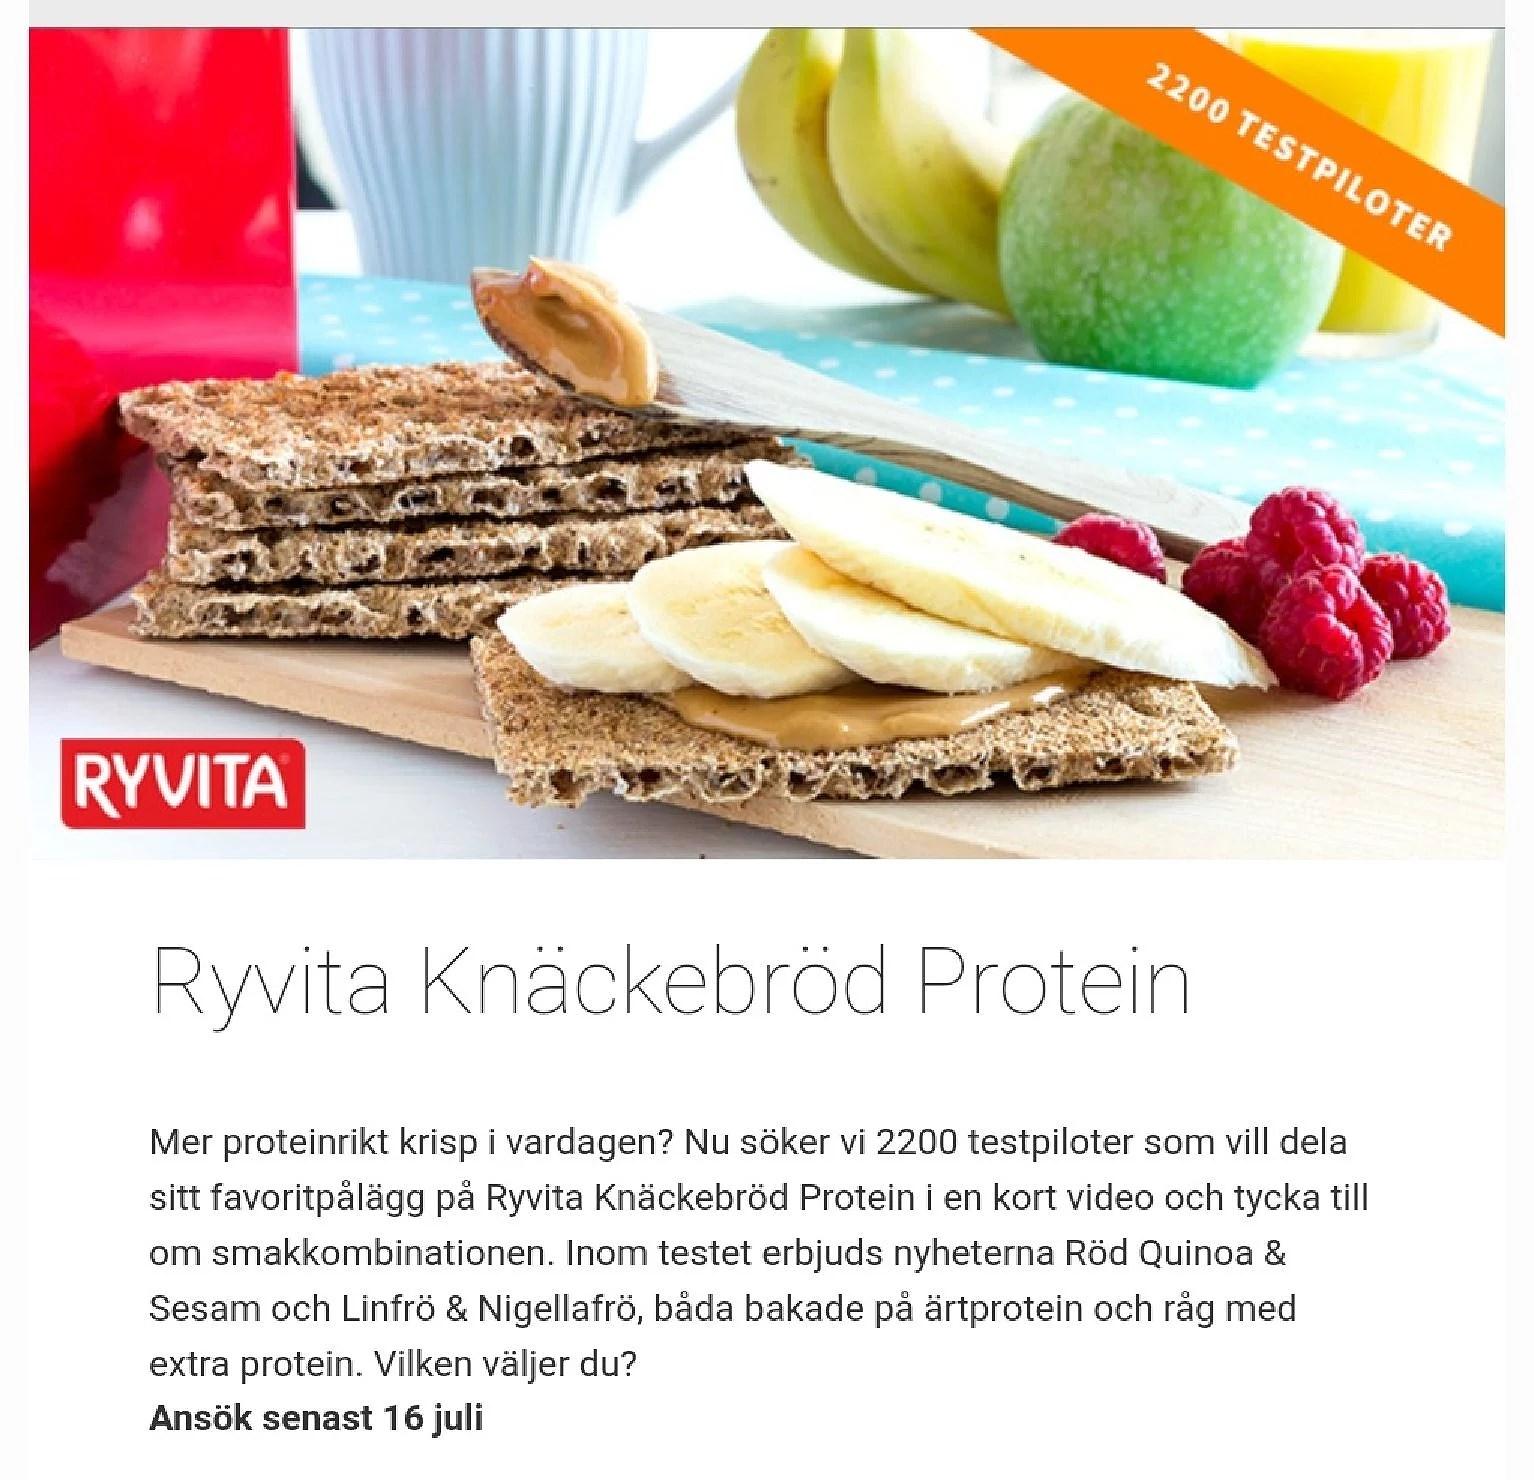 Ryvita protein knäckebröd söker provsmakare...